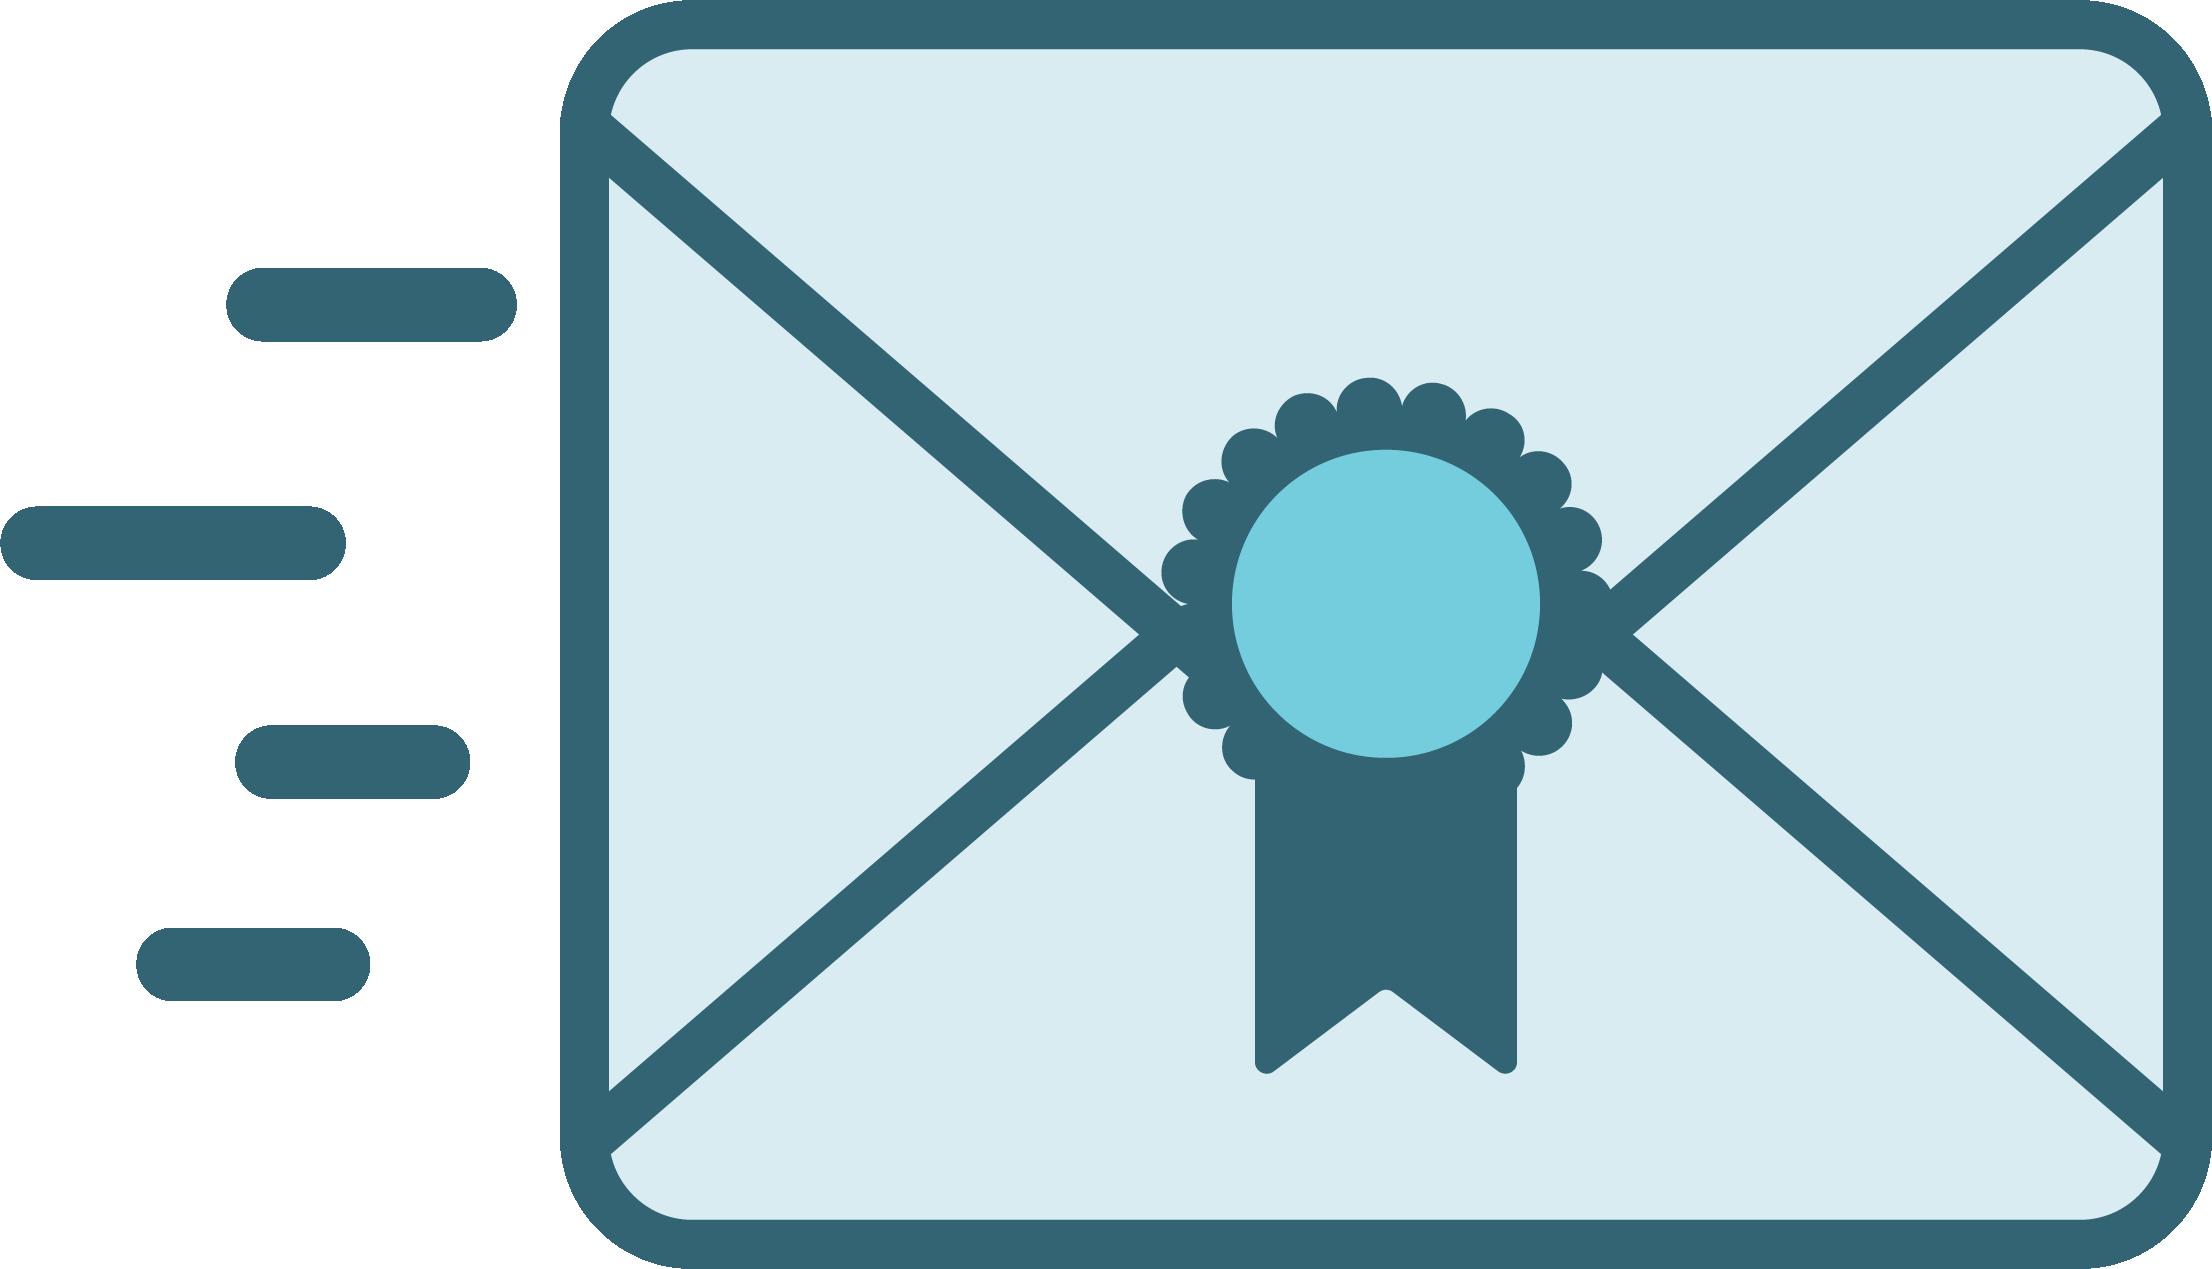 Einladungslink per E-Mail senden